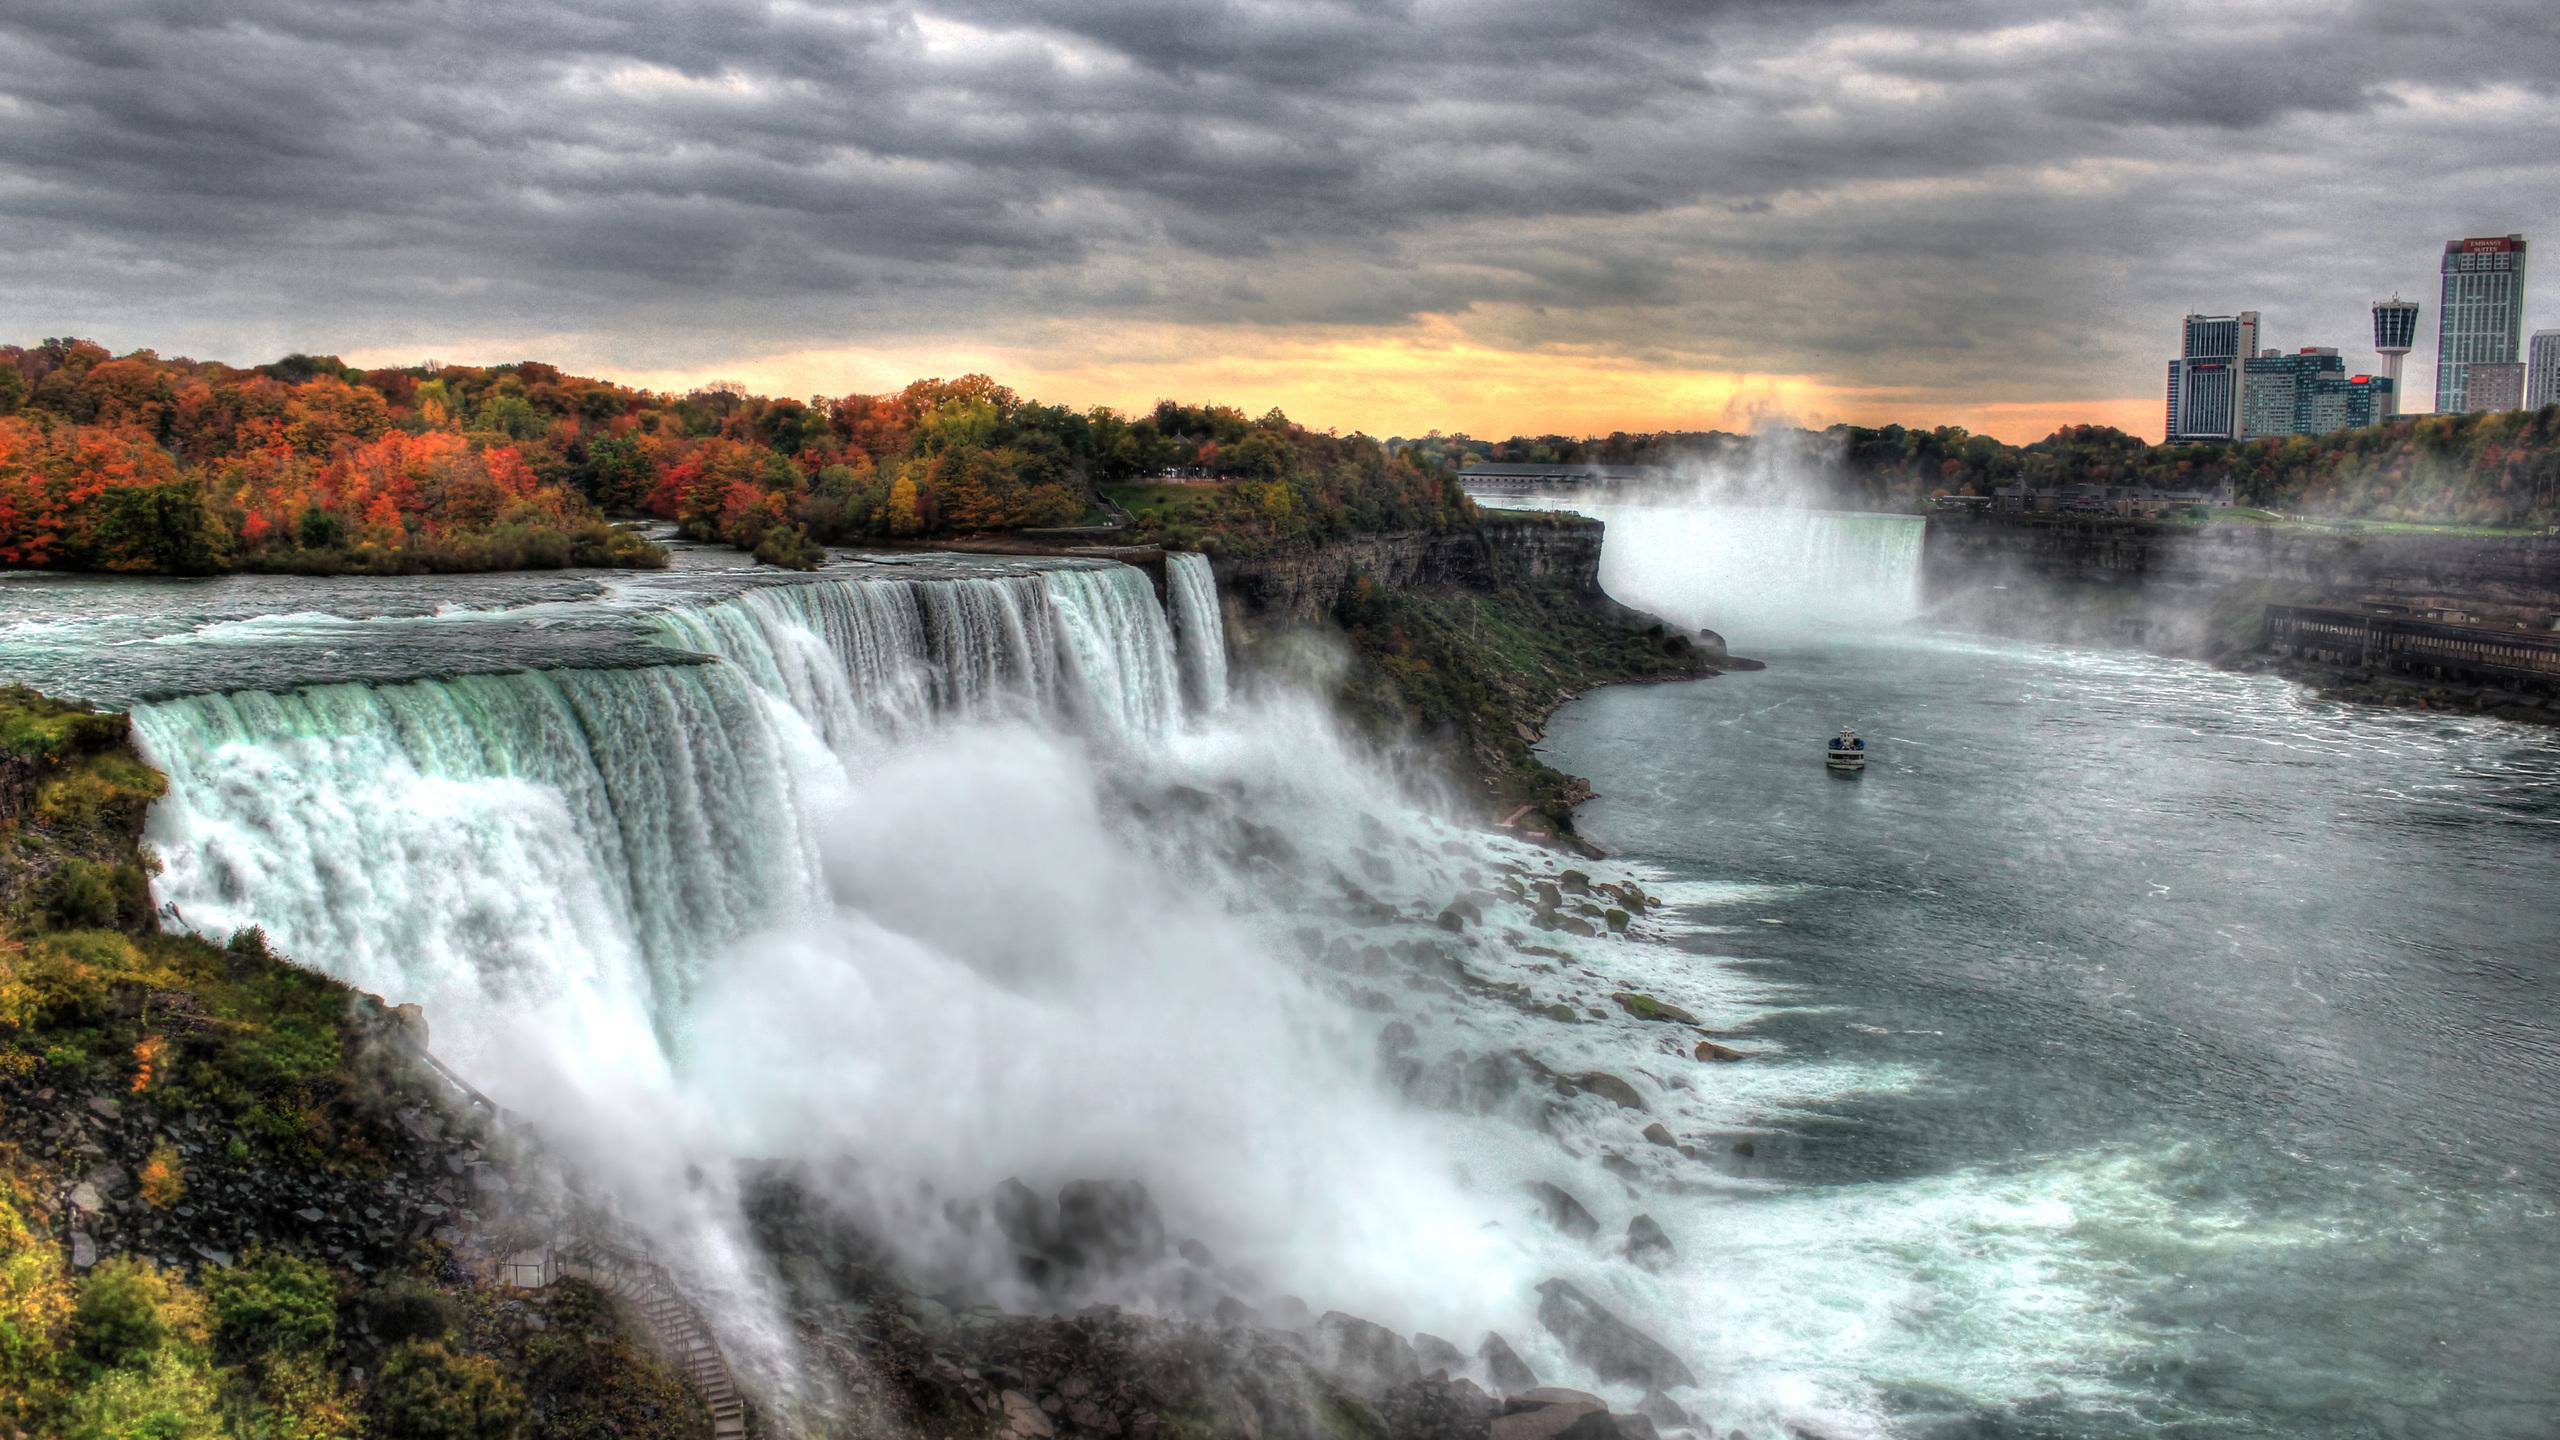 2560x1440 Sunset At Niagara Falls 5k 1440p Resolution Hd 4k